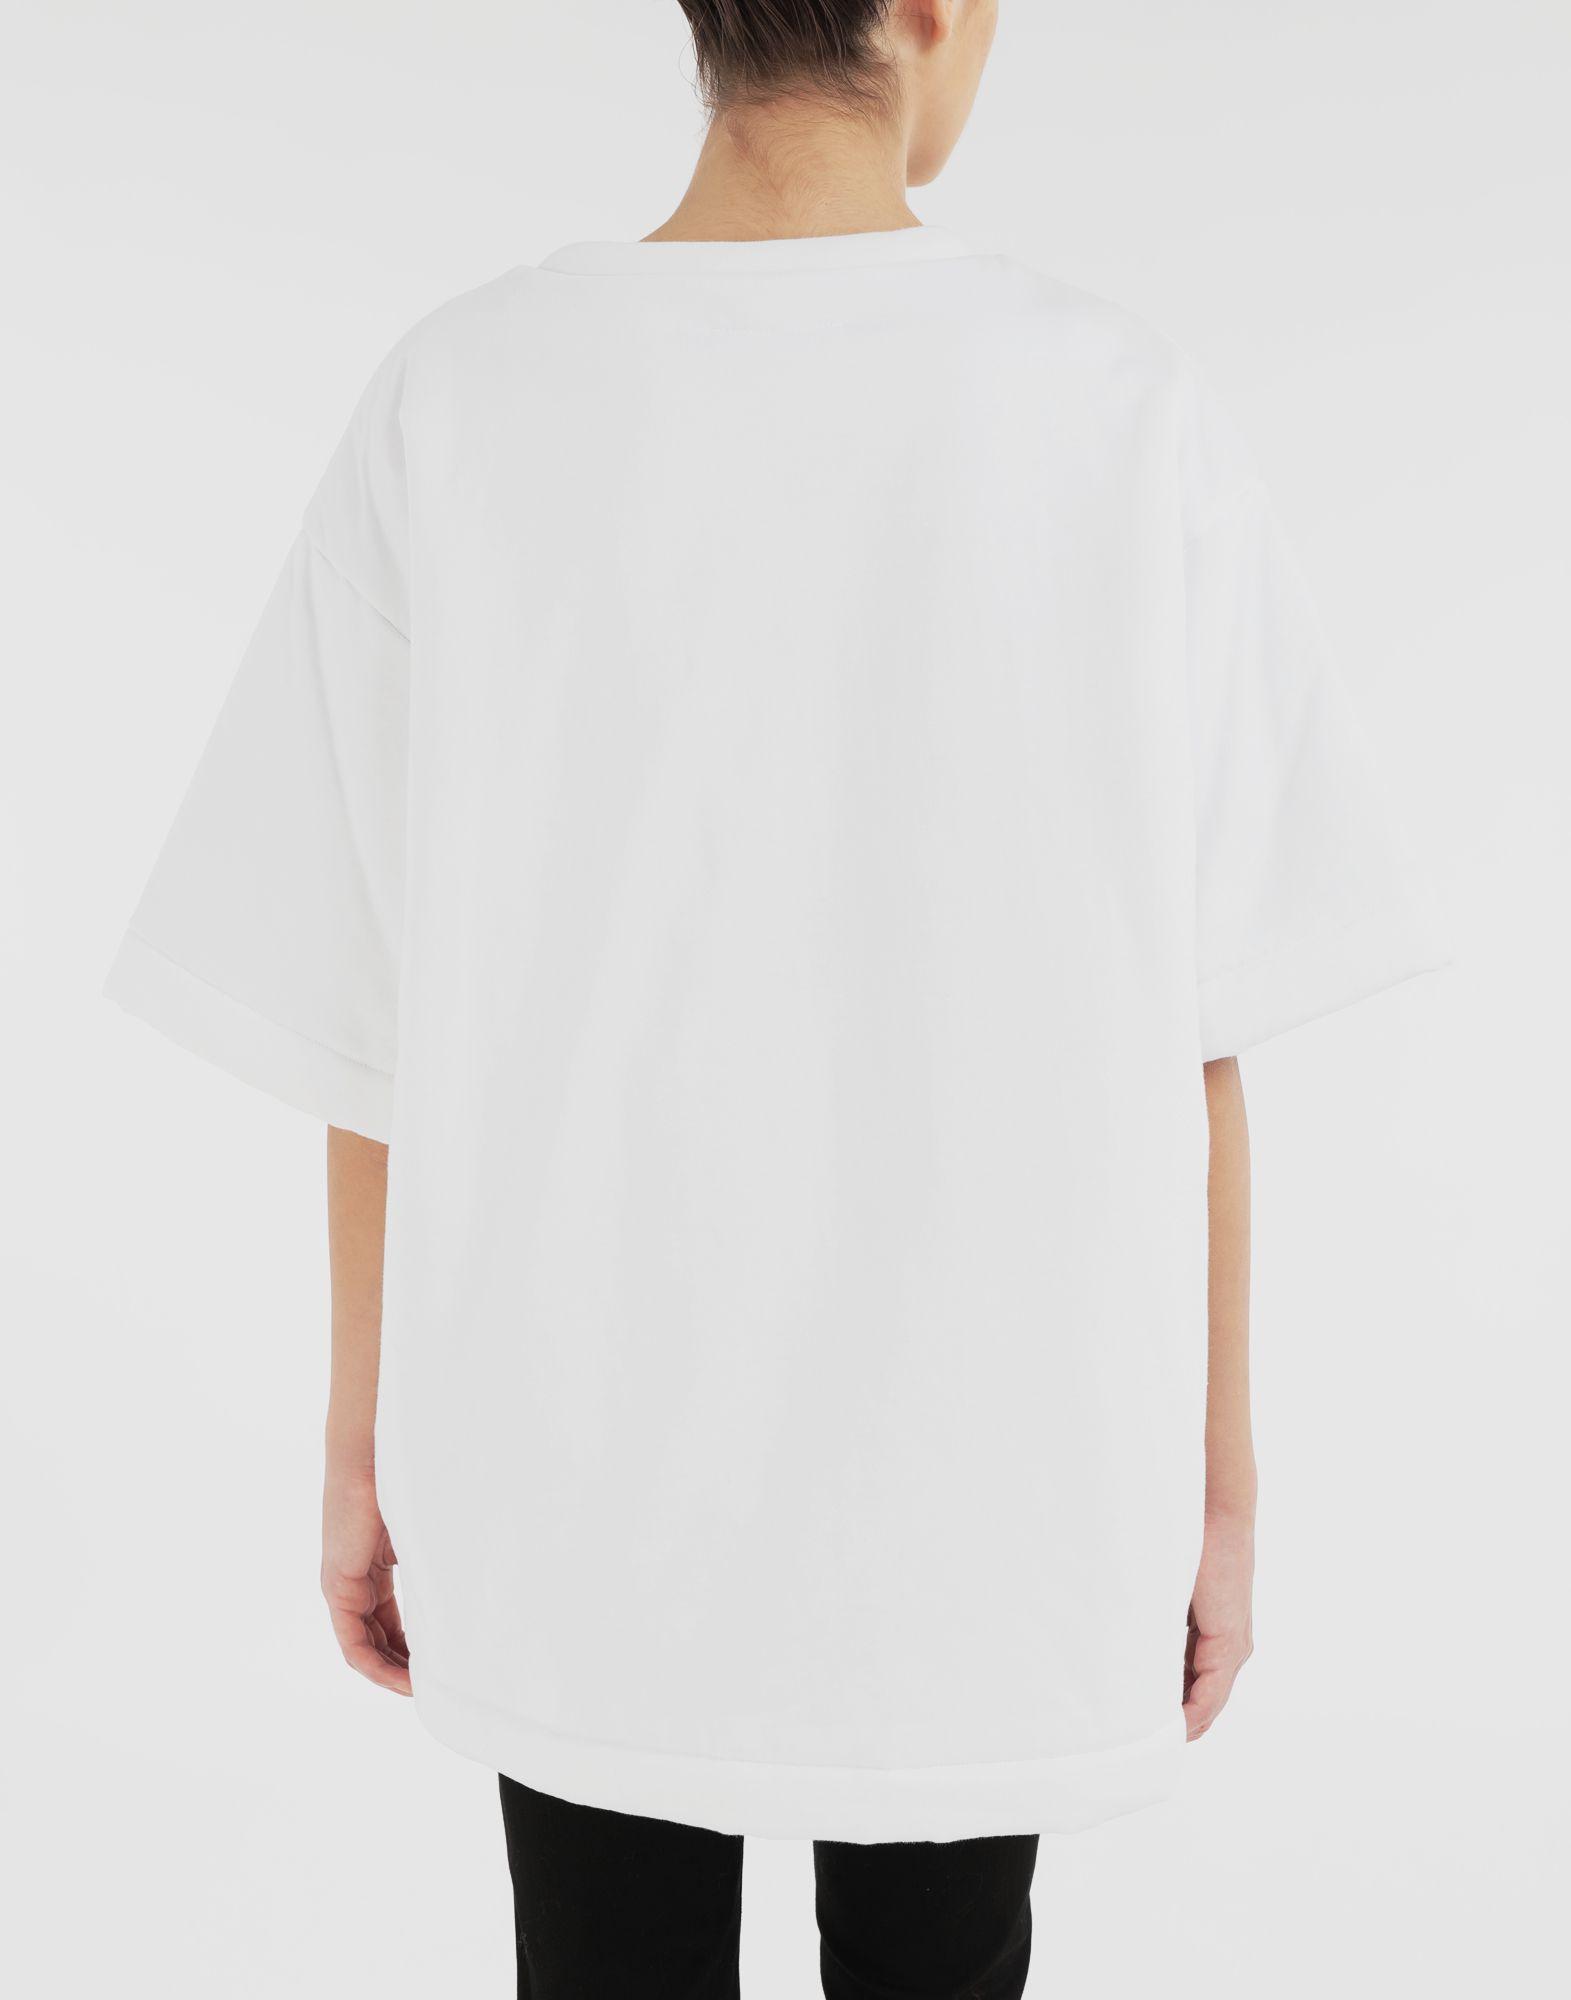 MM6 MAISON MARGIELA Wendbares Logo-T-Shirt Kurzärmliges T-Shirt Dame e